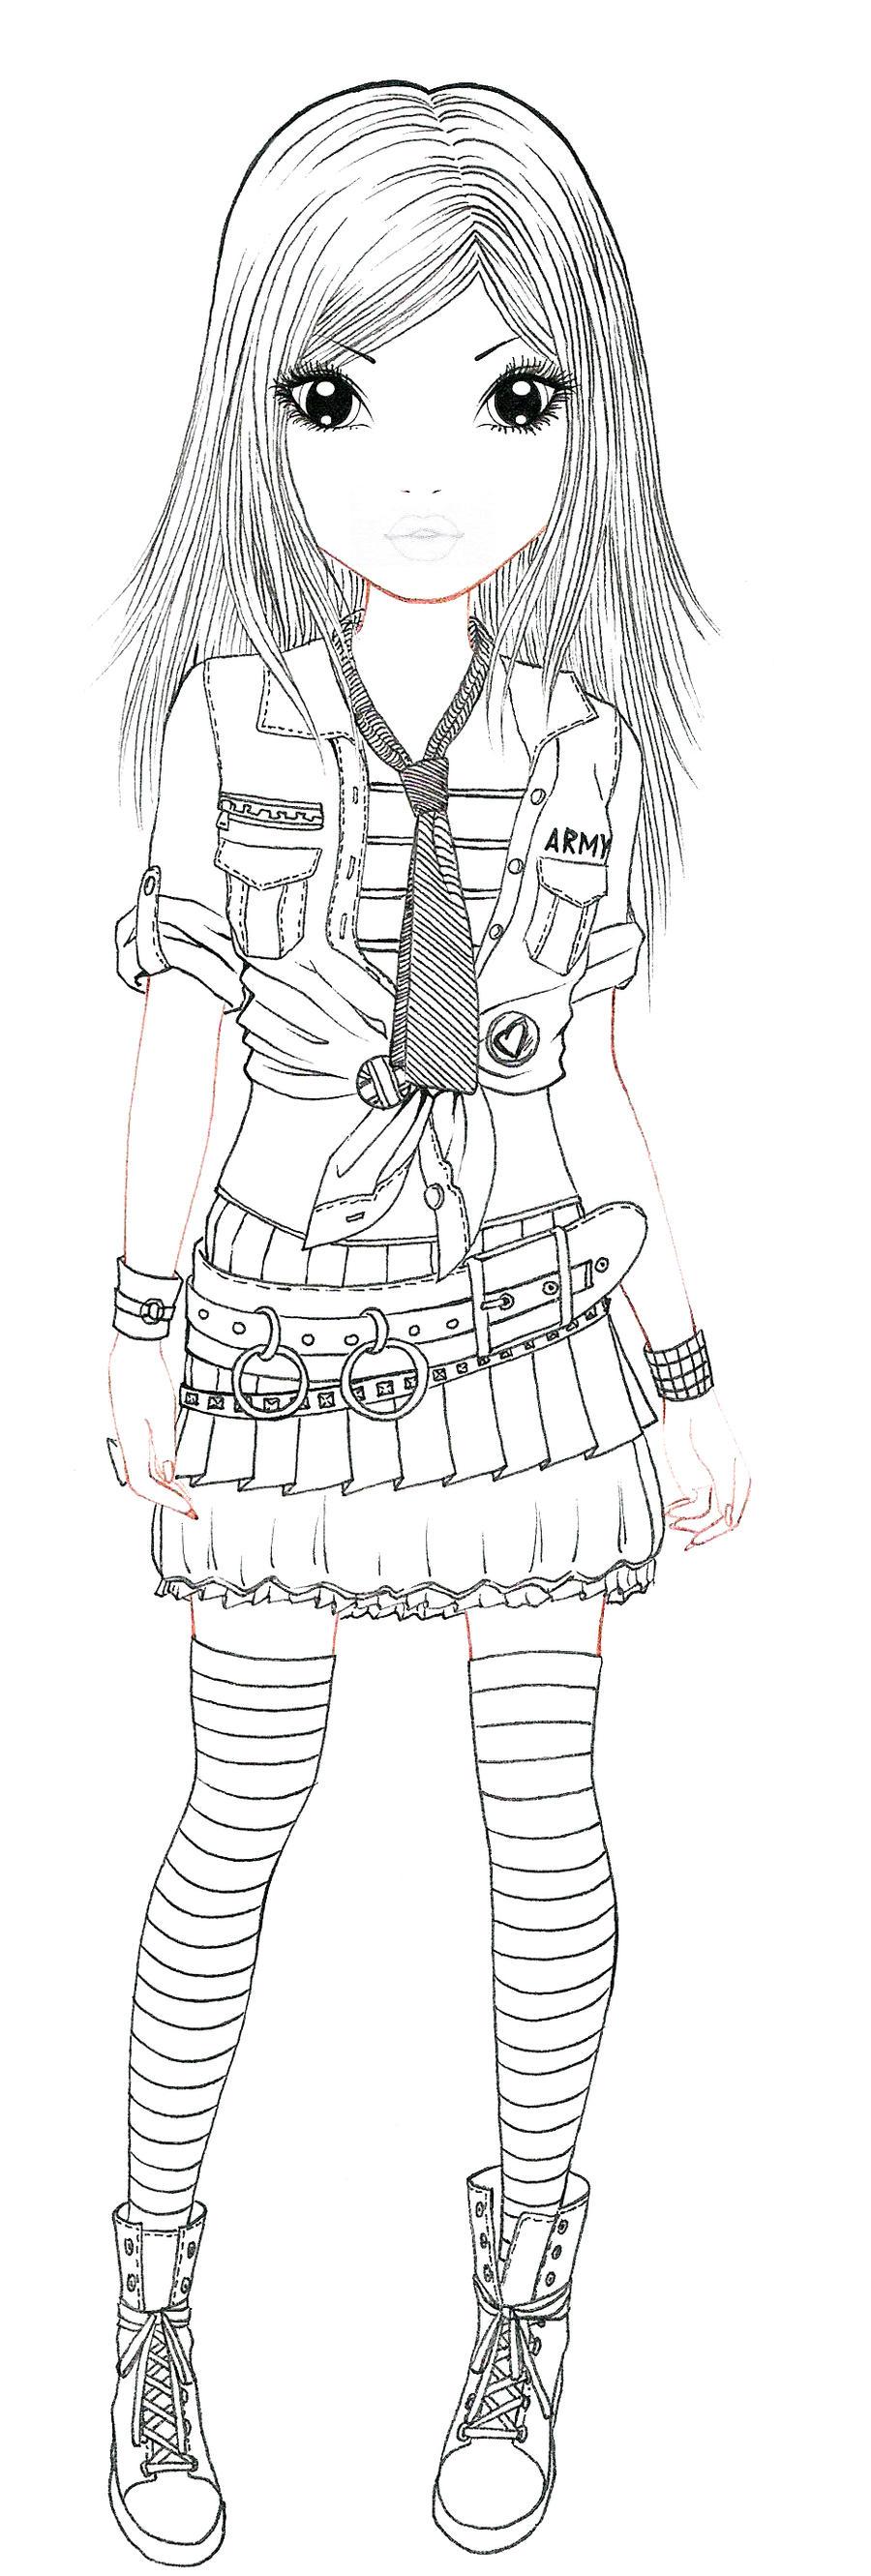 Army lineart by aya ichigo on deviantart - Dessin top model ...